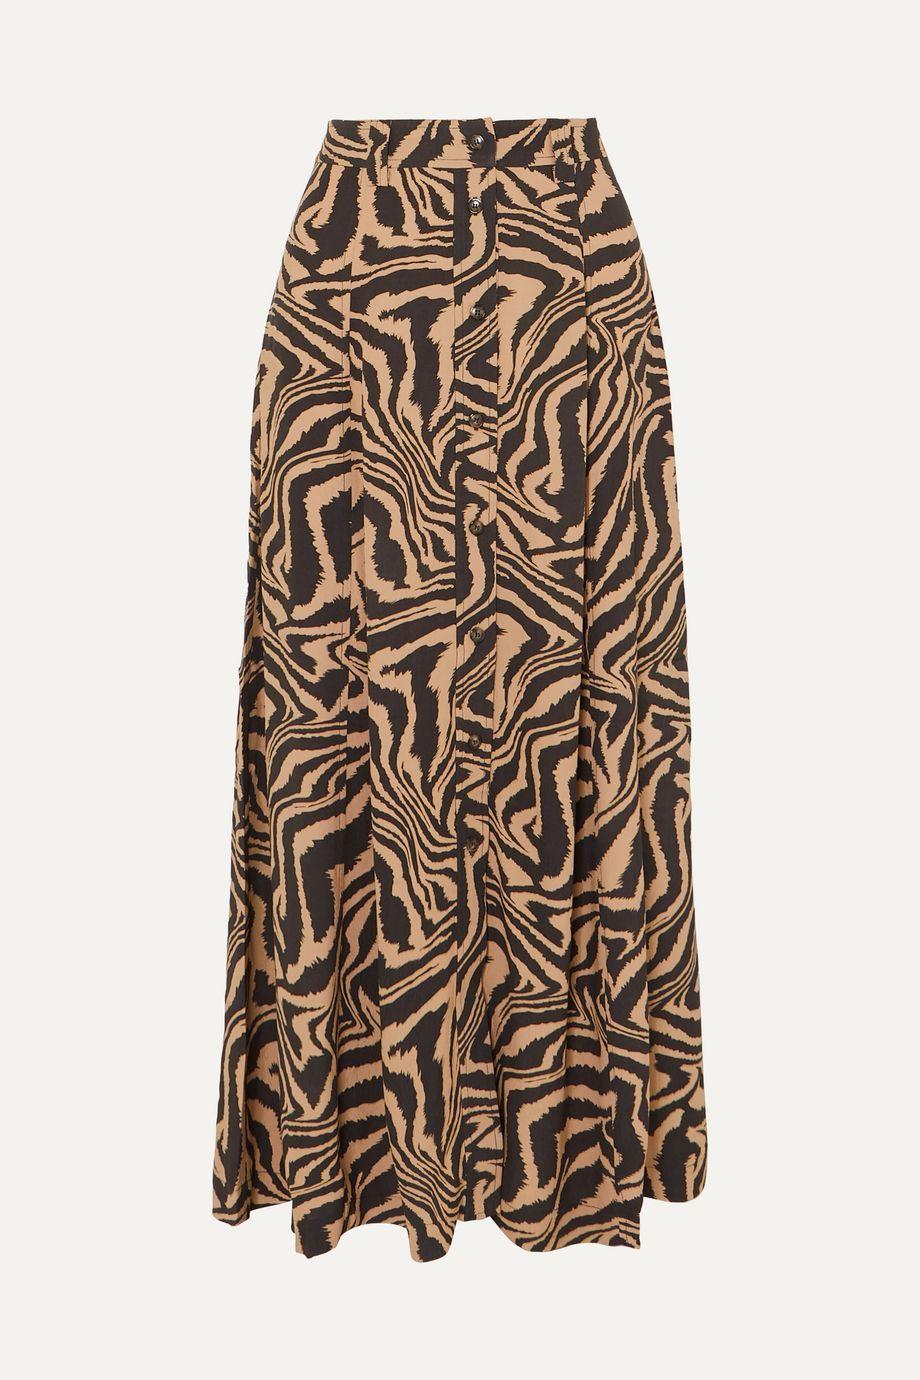 GANNI Tiger-print crepe midi skirt